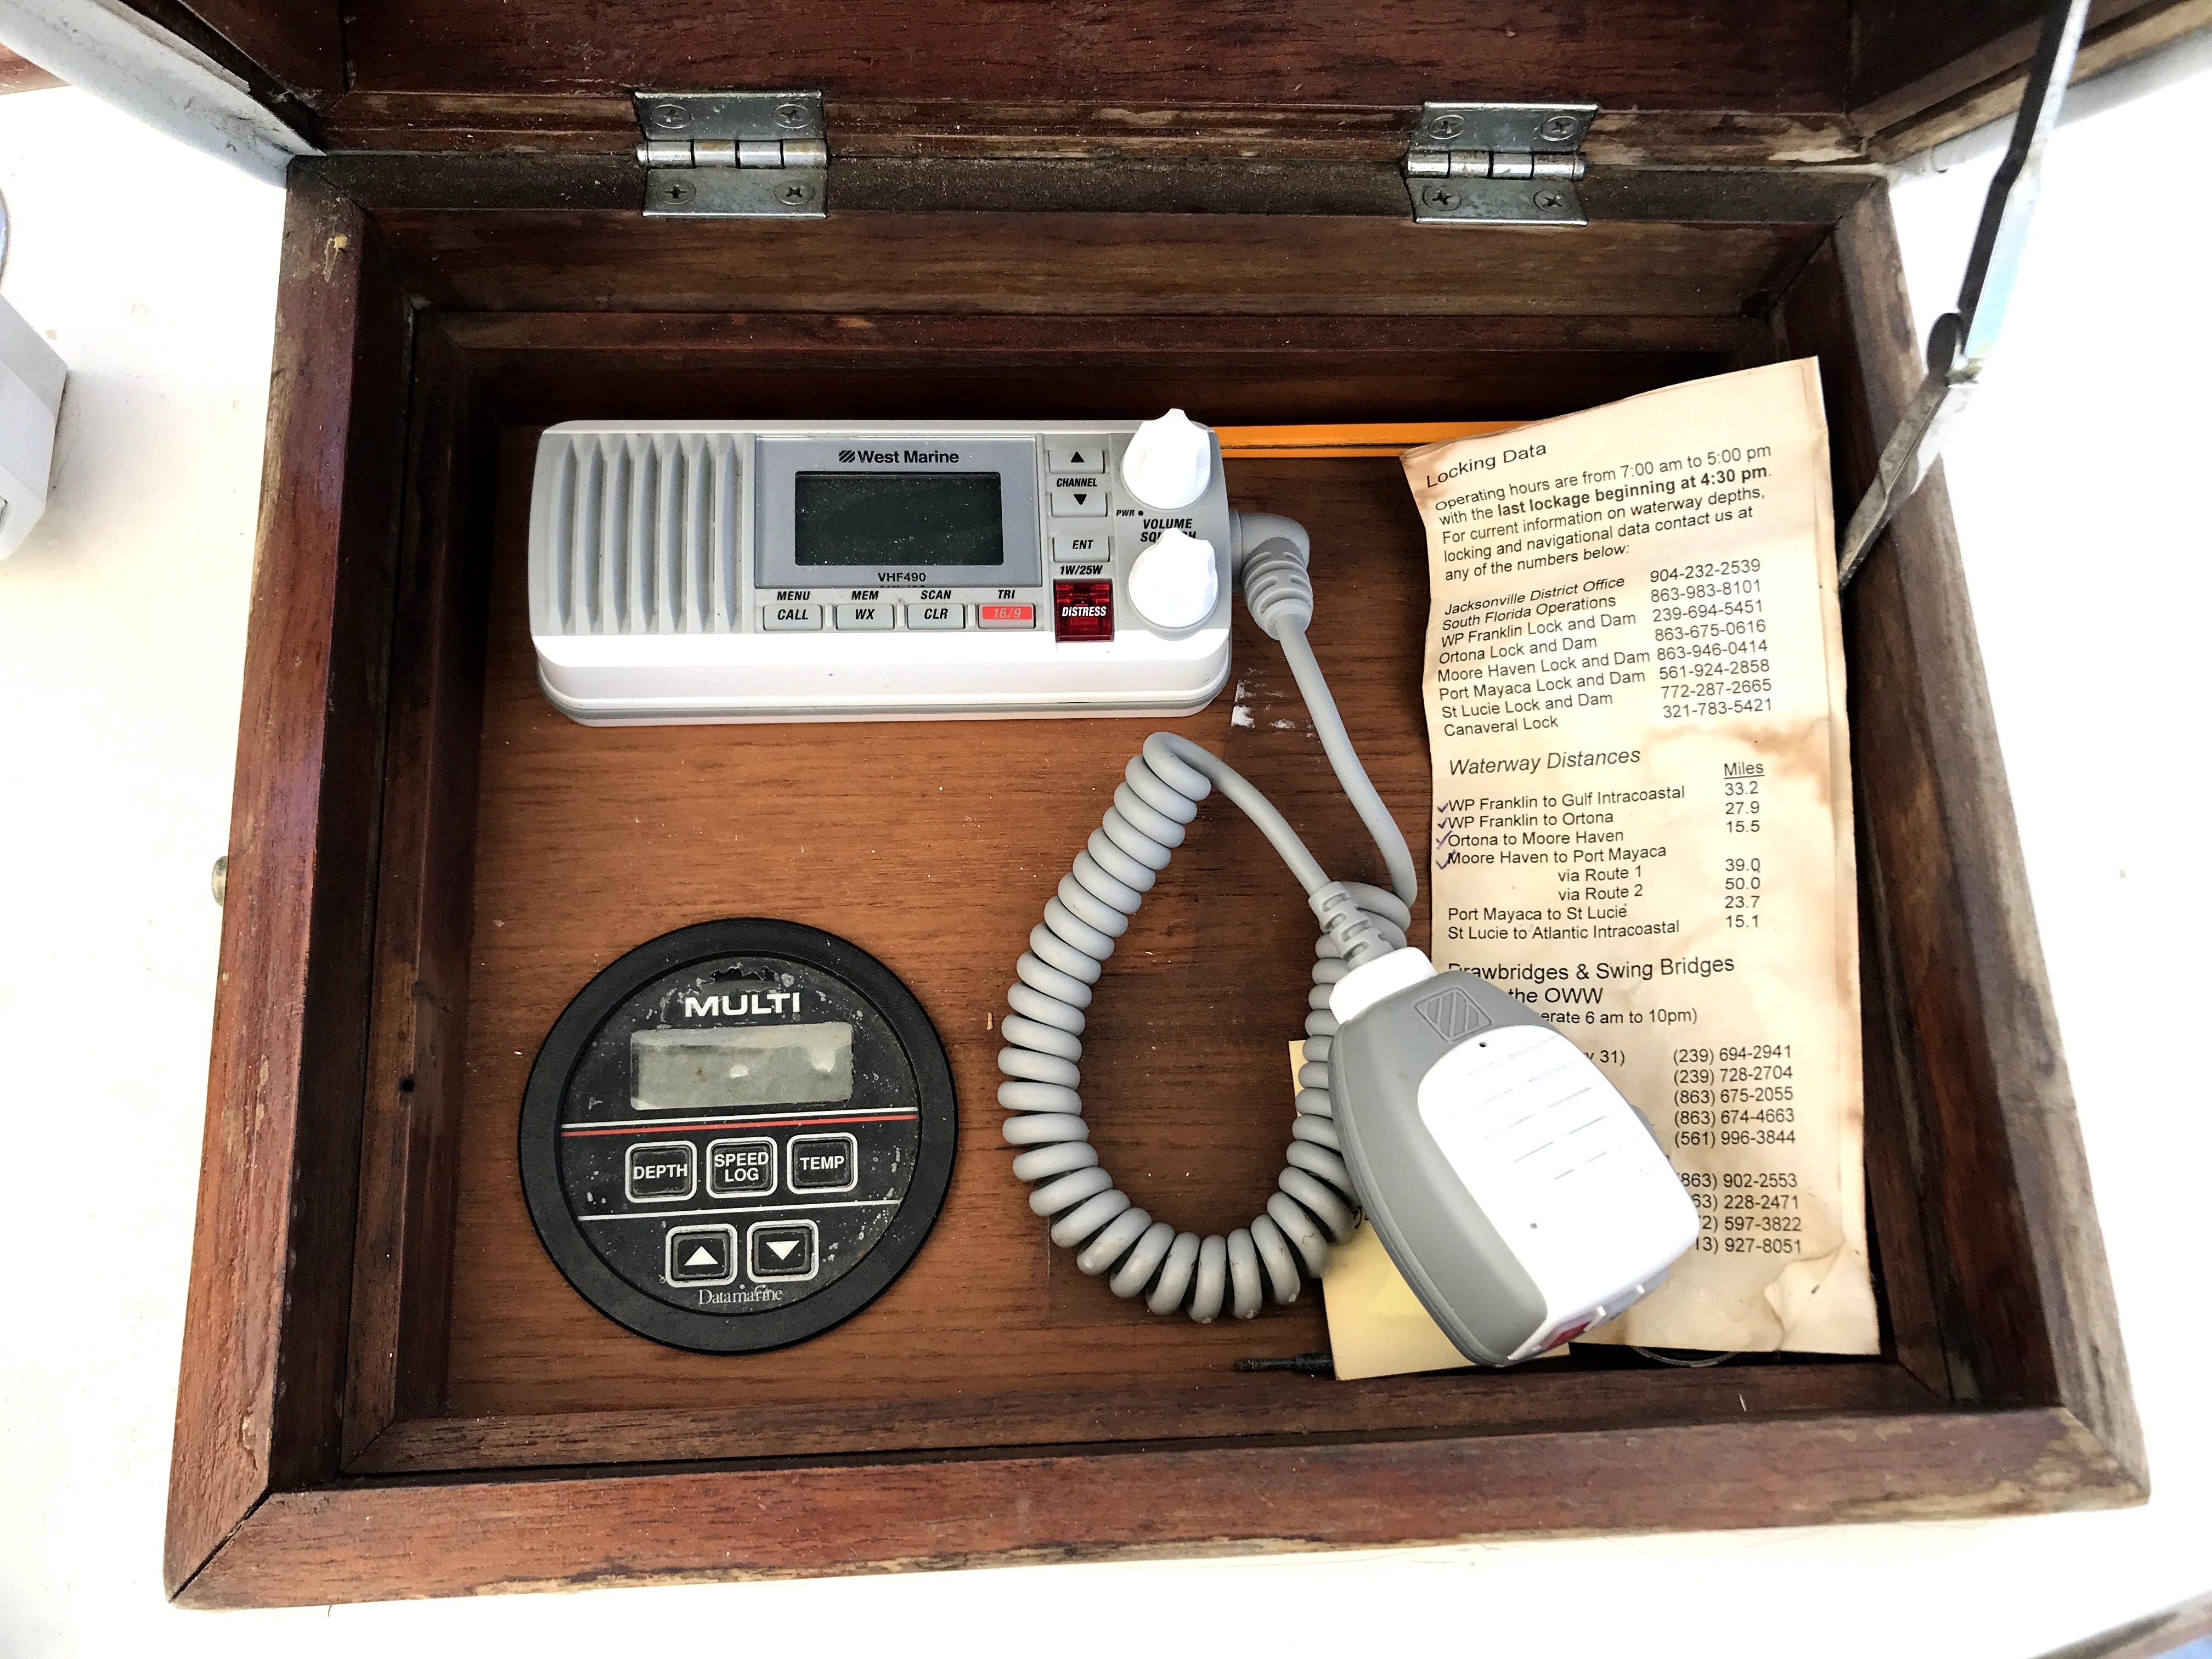 Sea Ranger SUNDECK - new West marine VHF